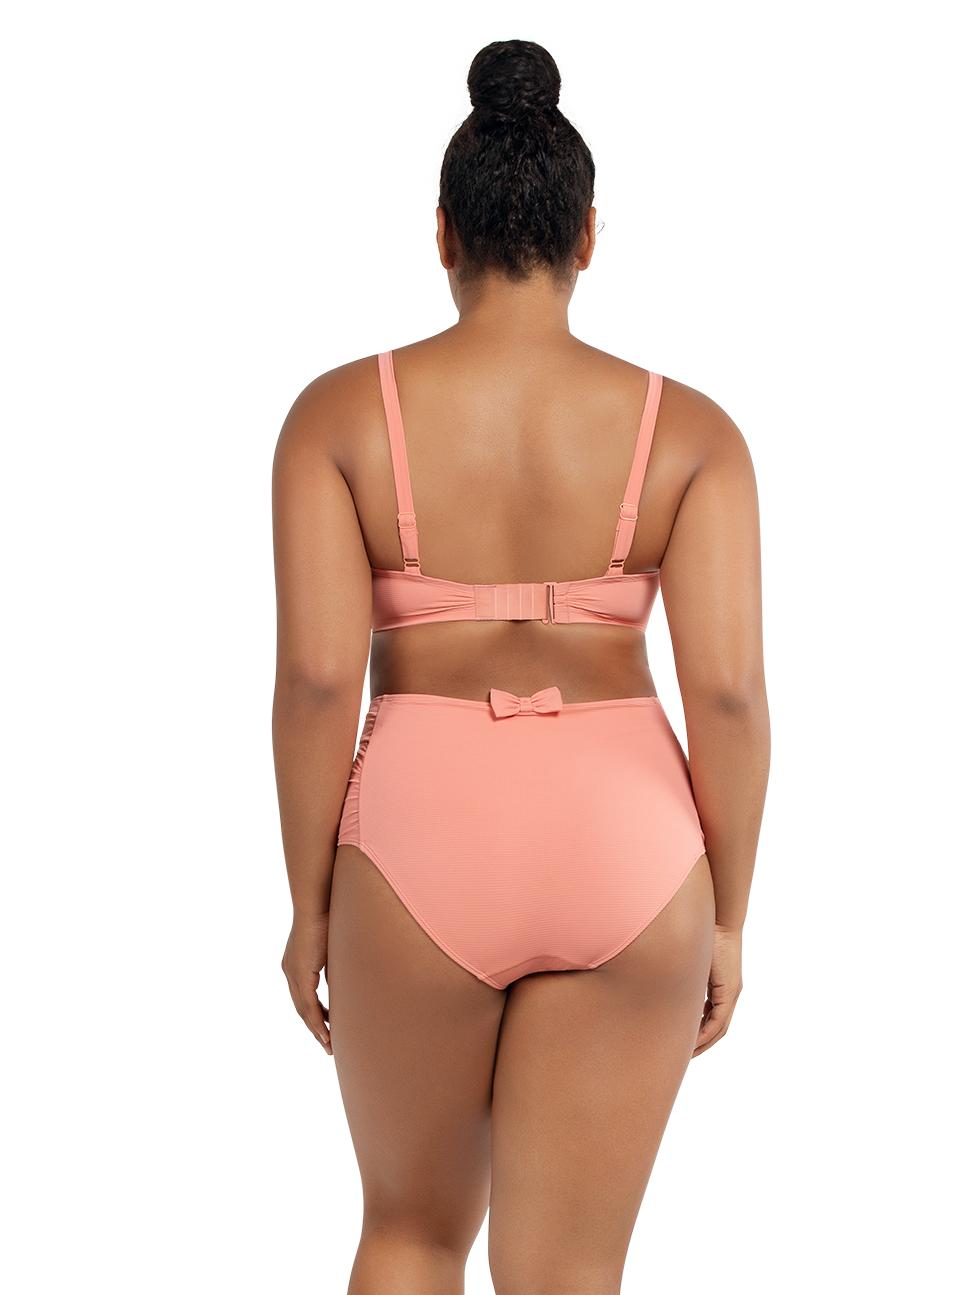 PARFAIT Vivien BalconetteBikiniTopS8162 HighwaistedBottomS8165 PinkBlush Back - Vivien Highwaisted Bottom Pink Blush S8165